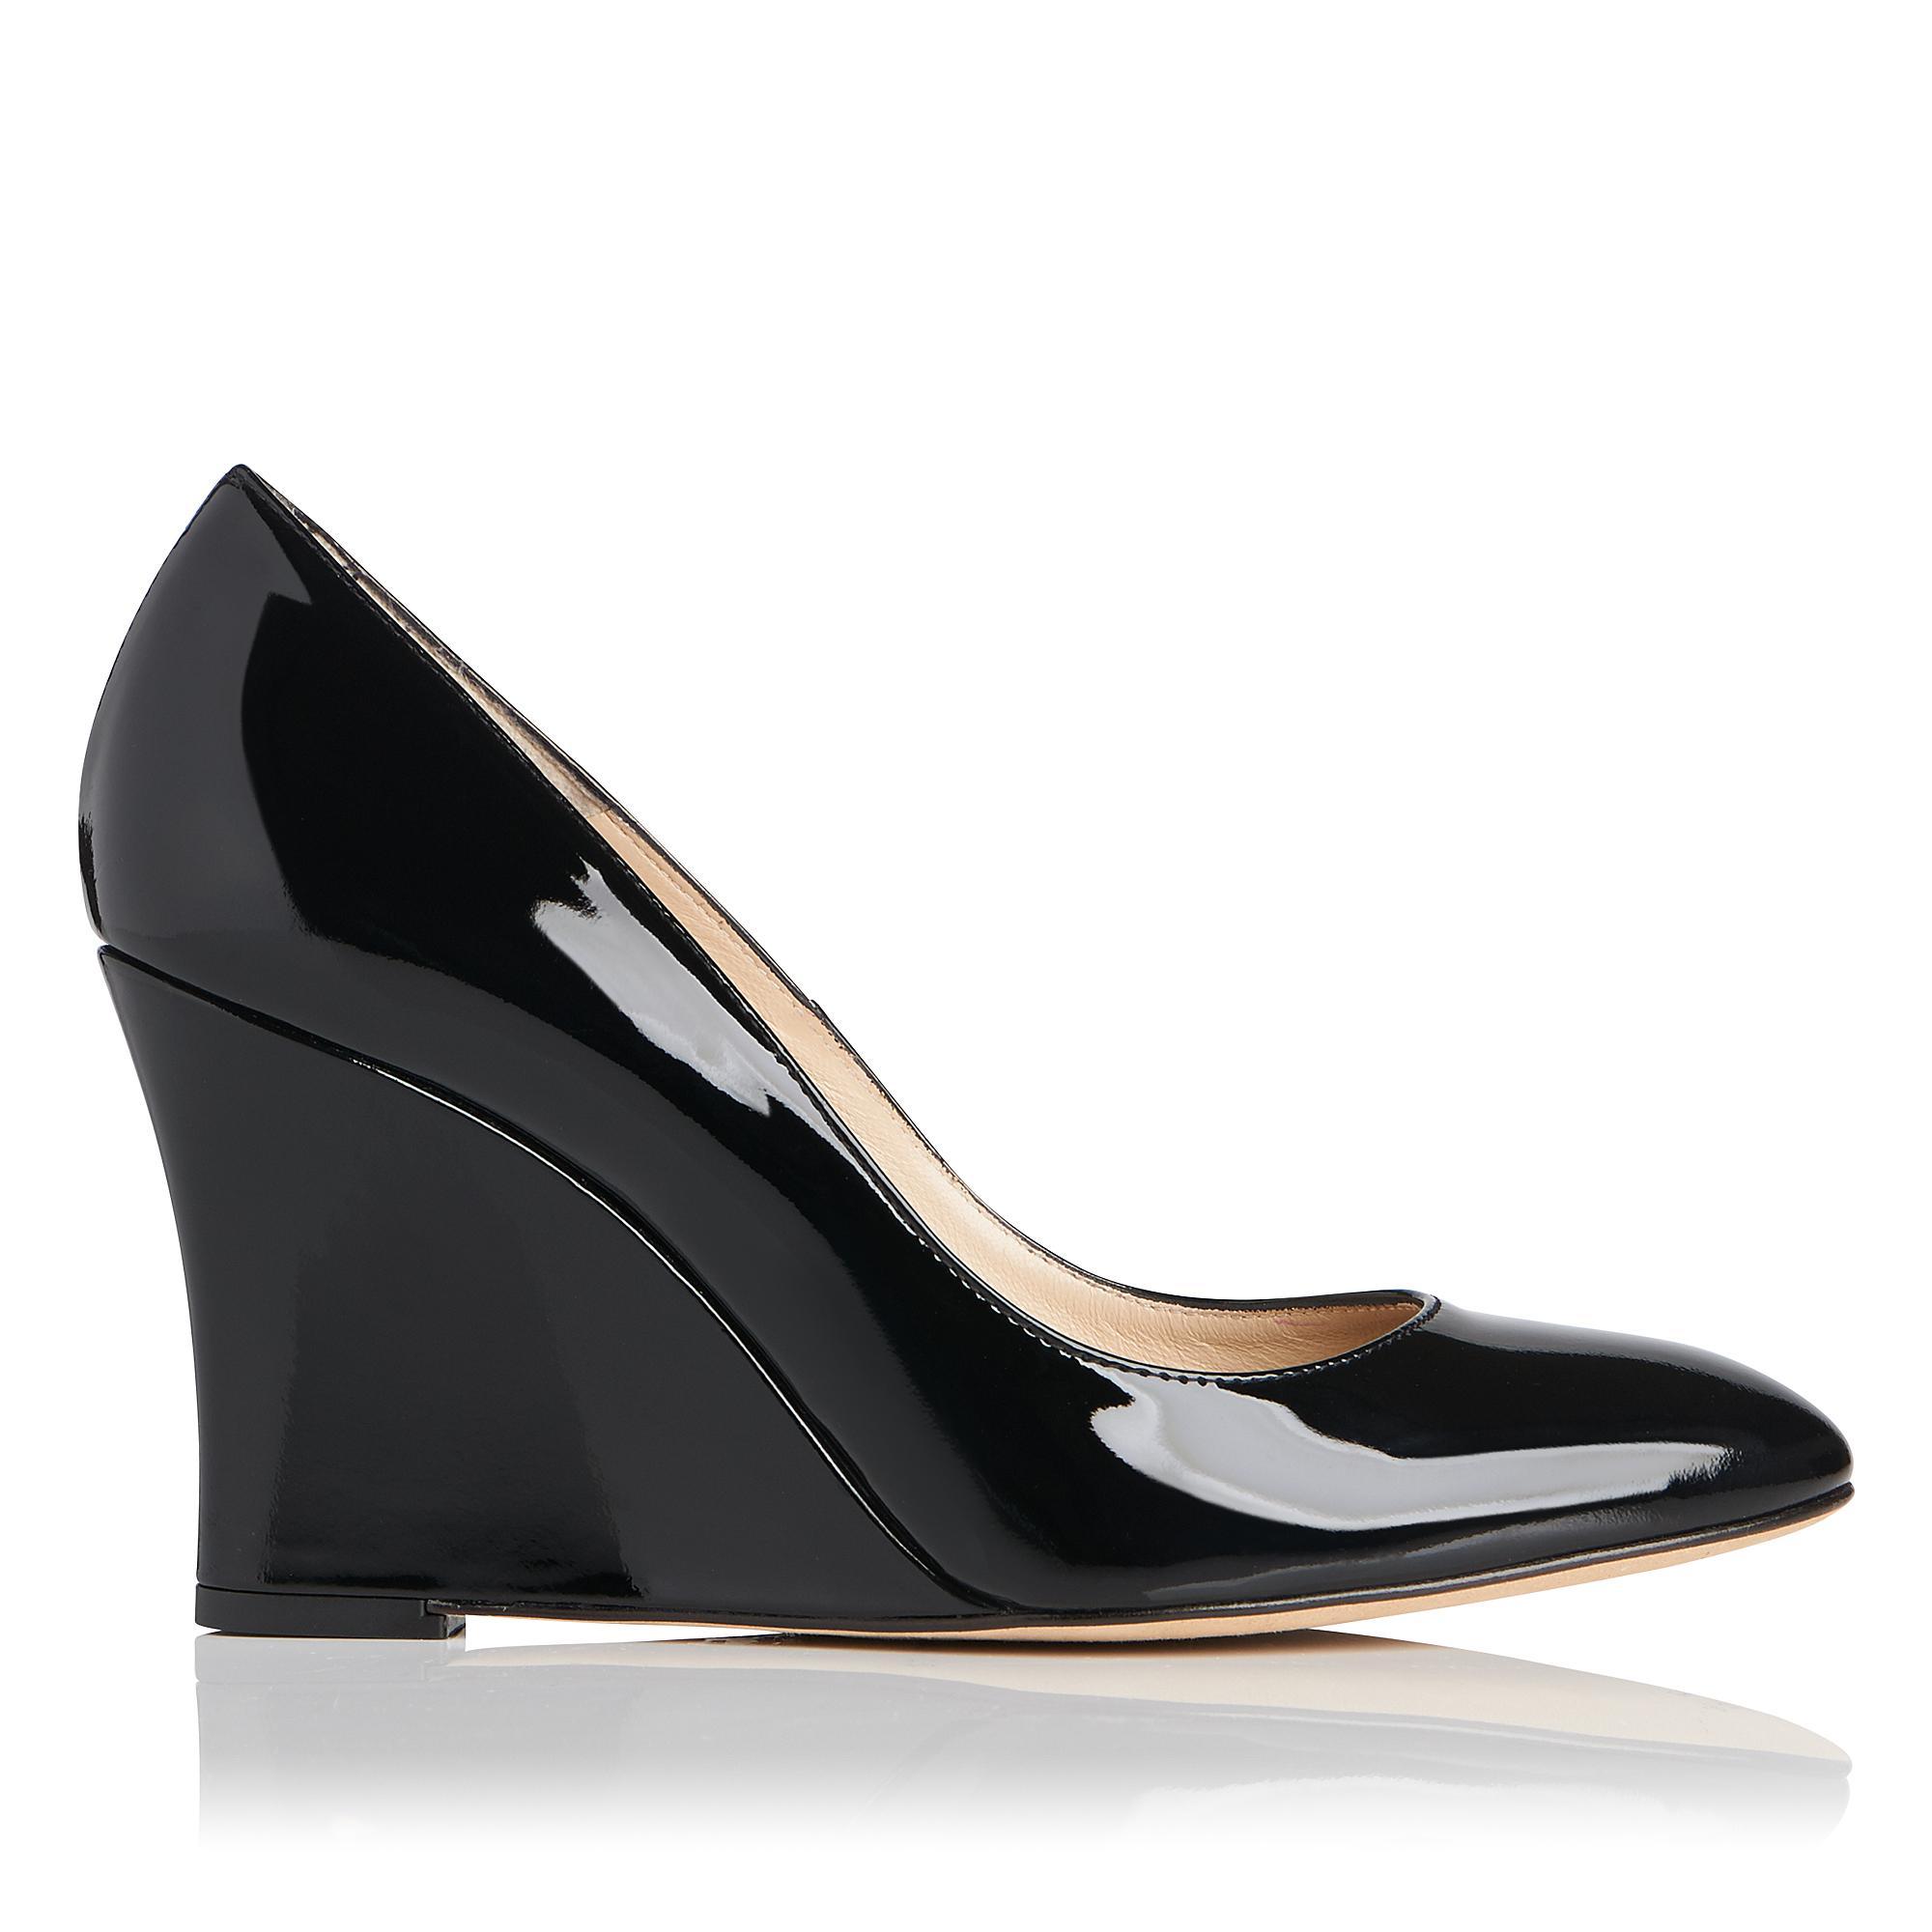 b694b5d0cf6 Esmeralda Black Patent Leather Wedge